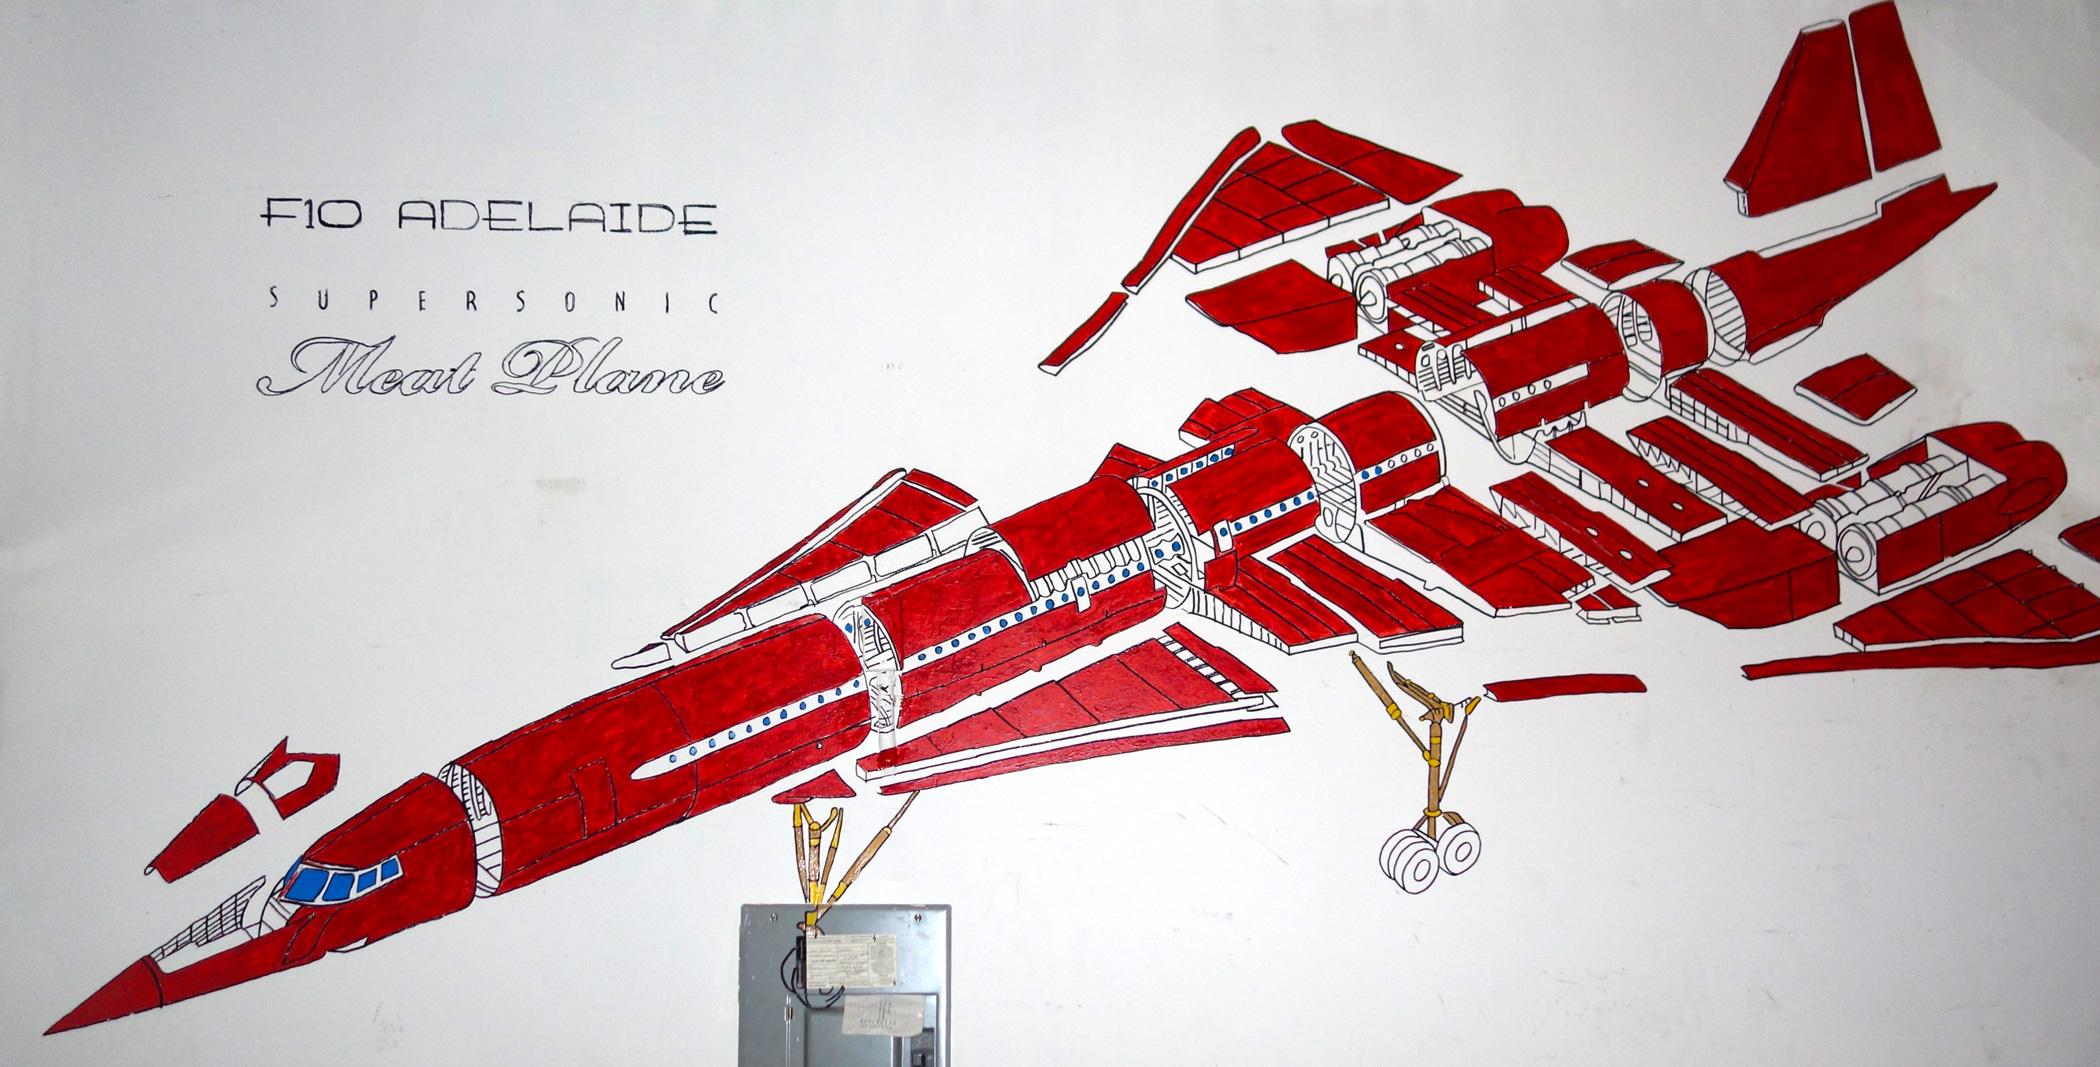 F10 Adelaide Supersonic Meat Plane  mural. Loft residence Bushwick, Brooklyn, NY.